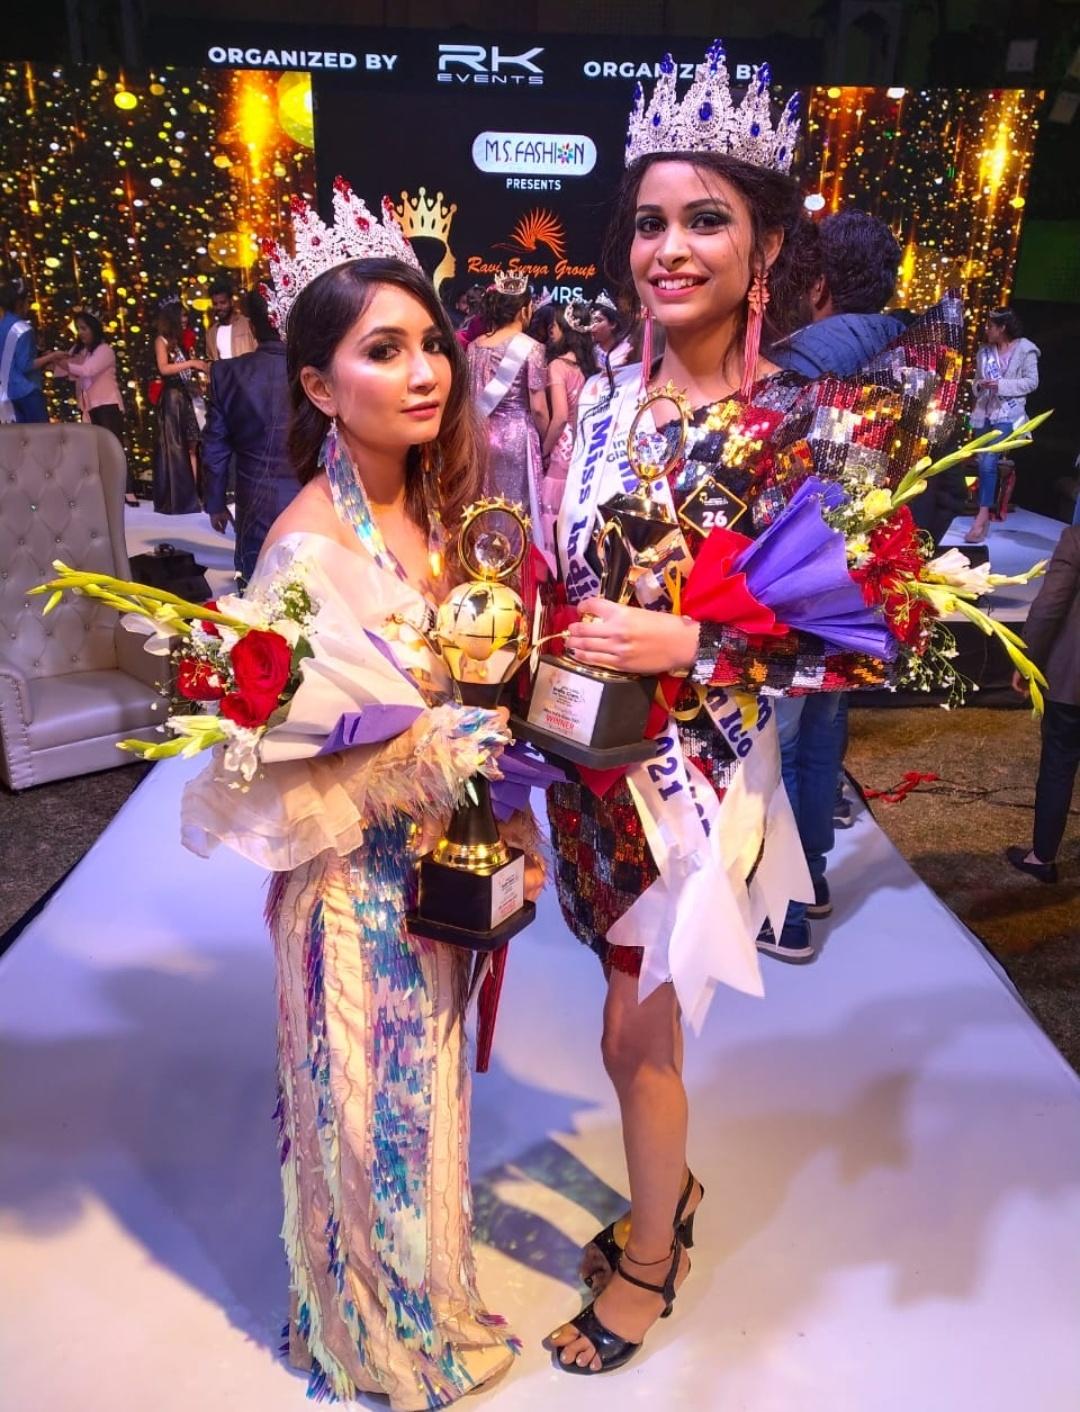 Rashika-Mudgal-has-achieved the-title-of-Miss-India-Glam-2020-and-Sneha-Rathore-won-Mrs-India-Glam-2021